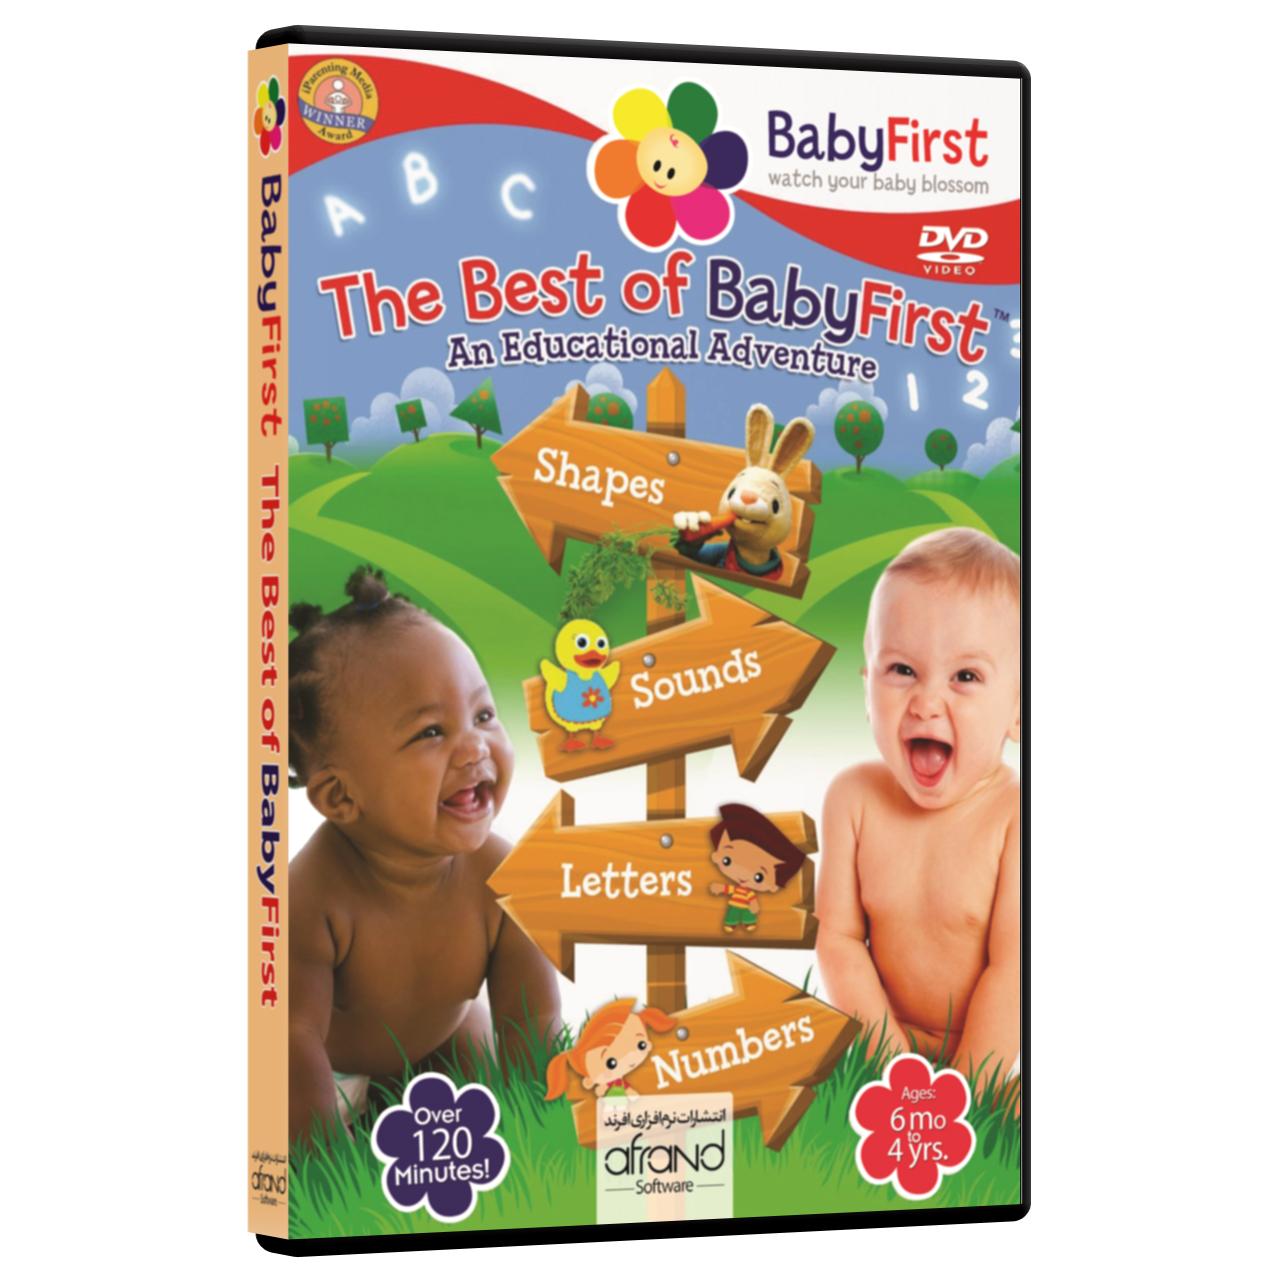 فیلم آموزش زبان انگلیسی BabyFirst The Best of Baby First انتشارات نرم افزاری افرند